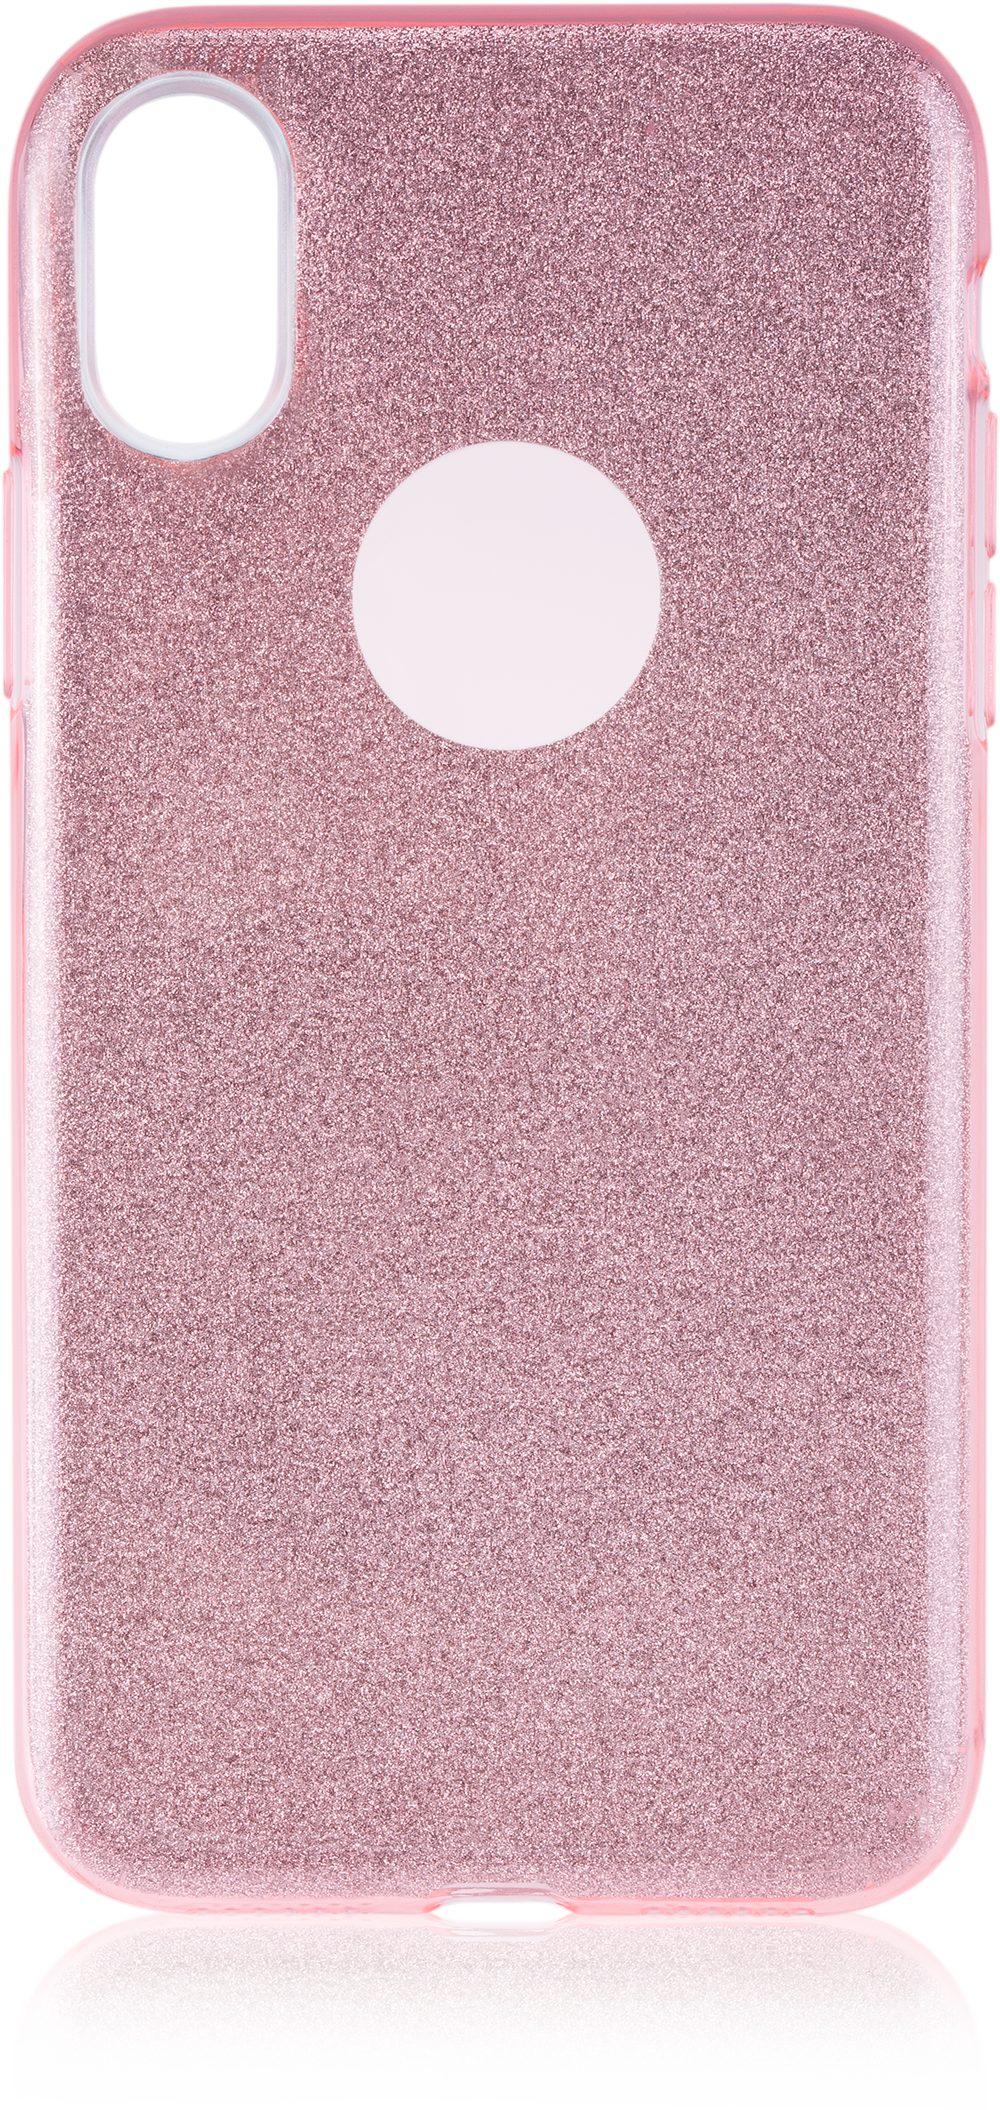 Scutes Deluxe GSM - Zubehör »Schutzhülle TPU - iPhone X glitzer rosa«